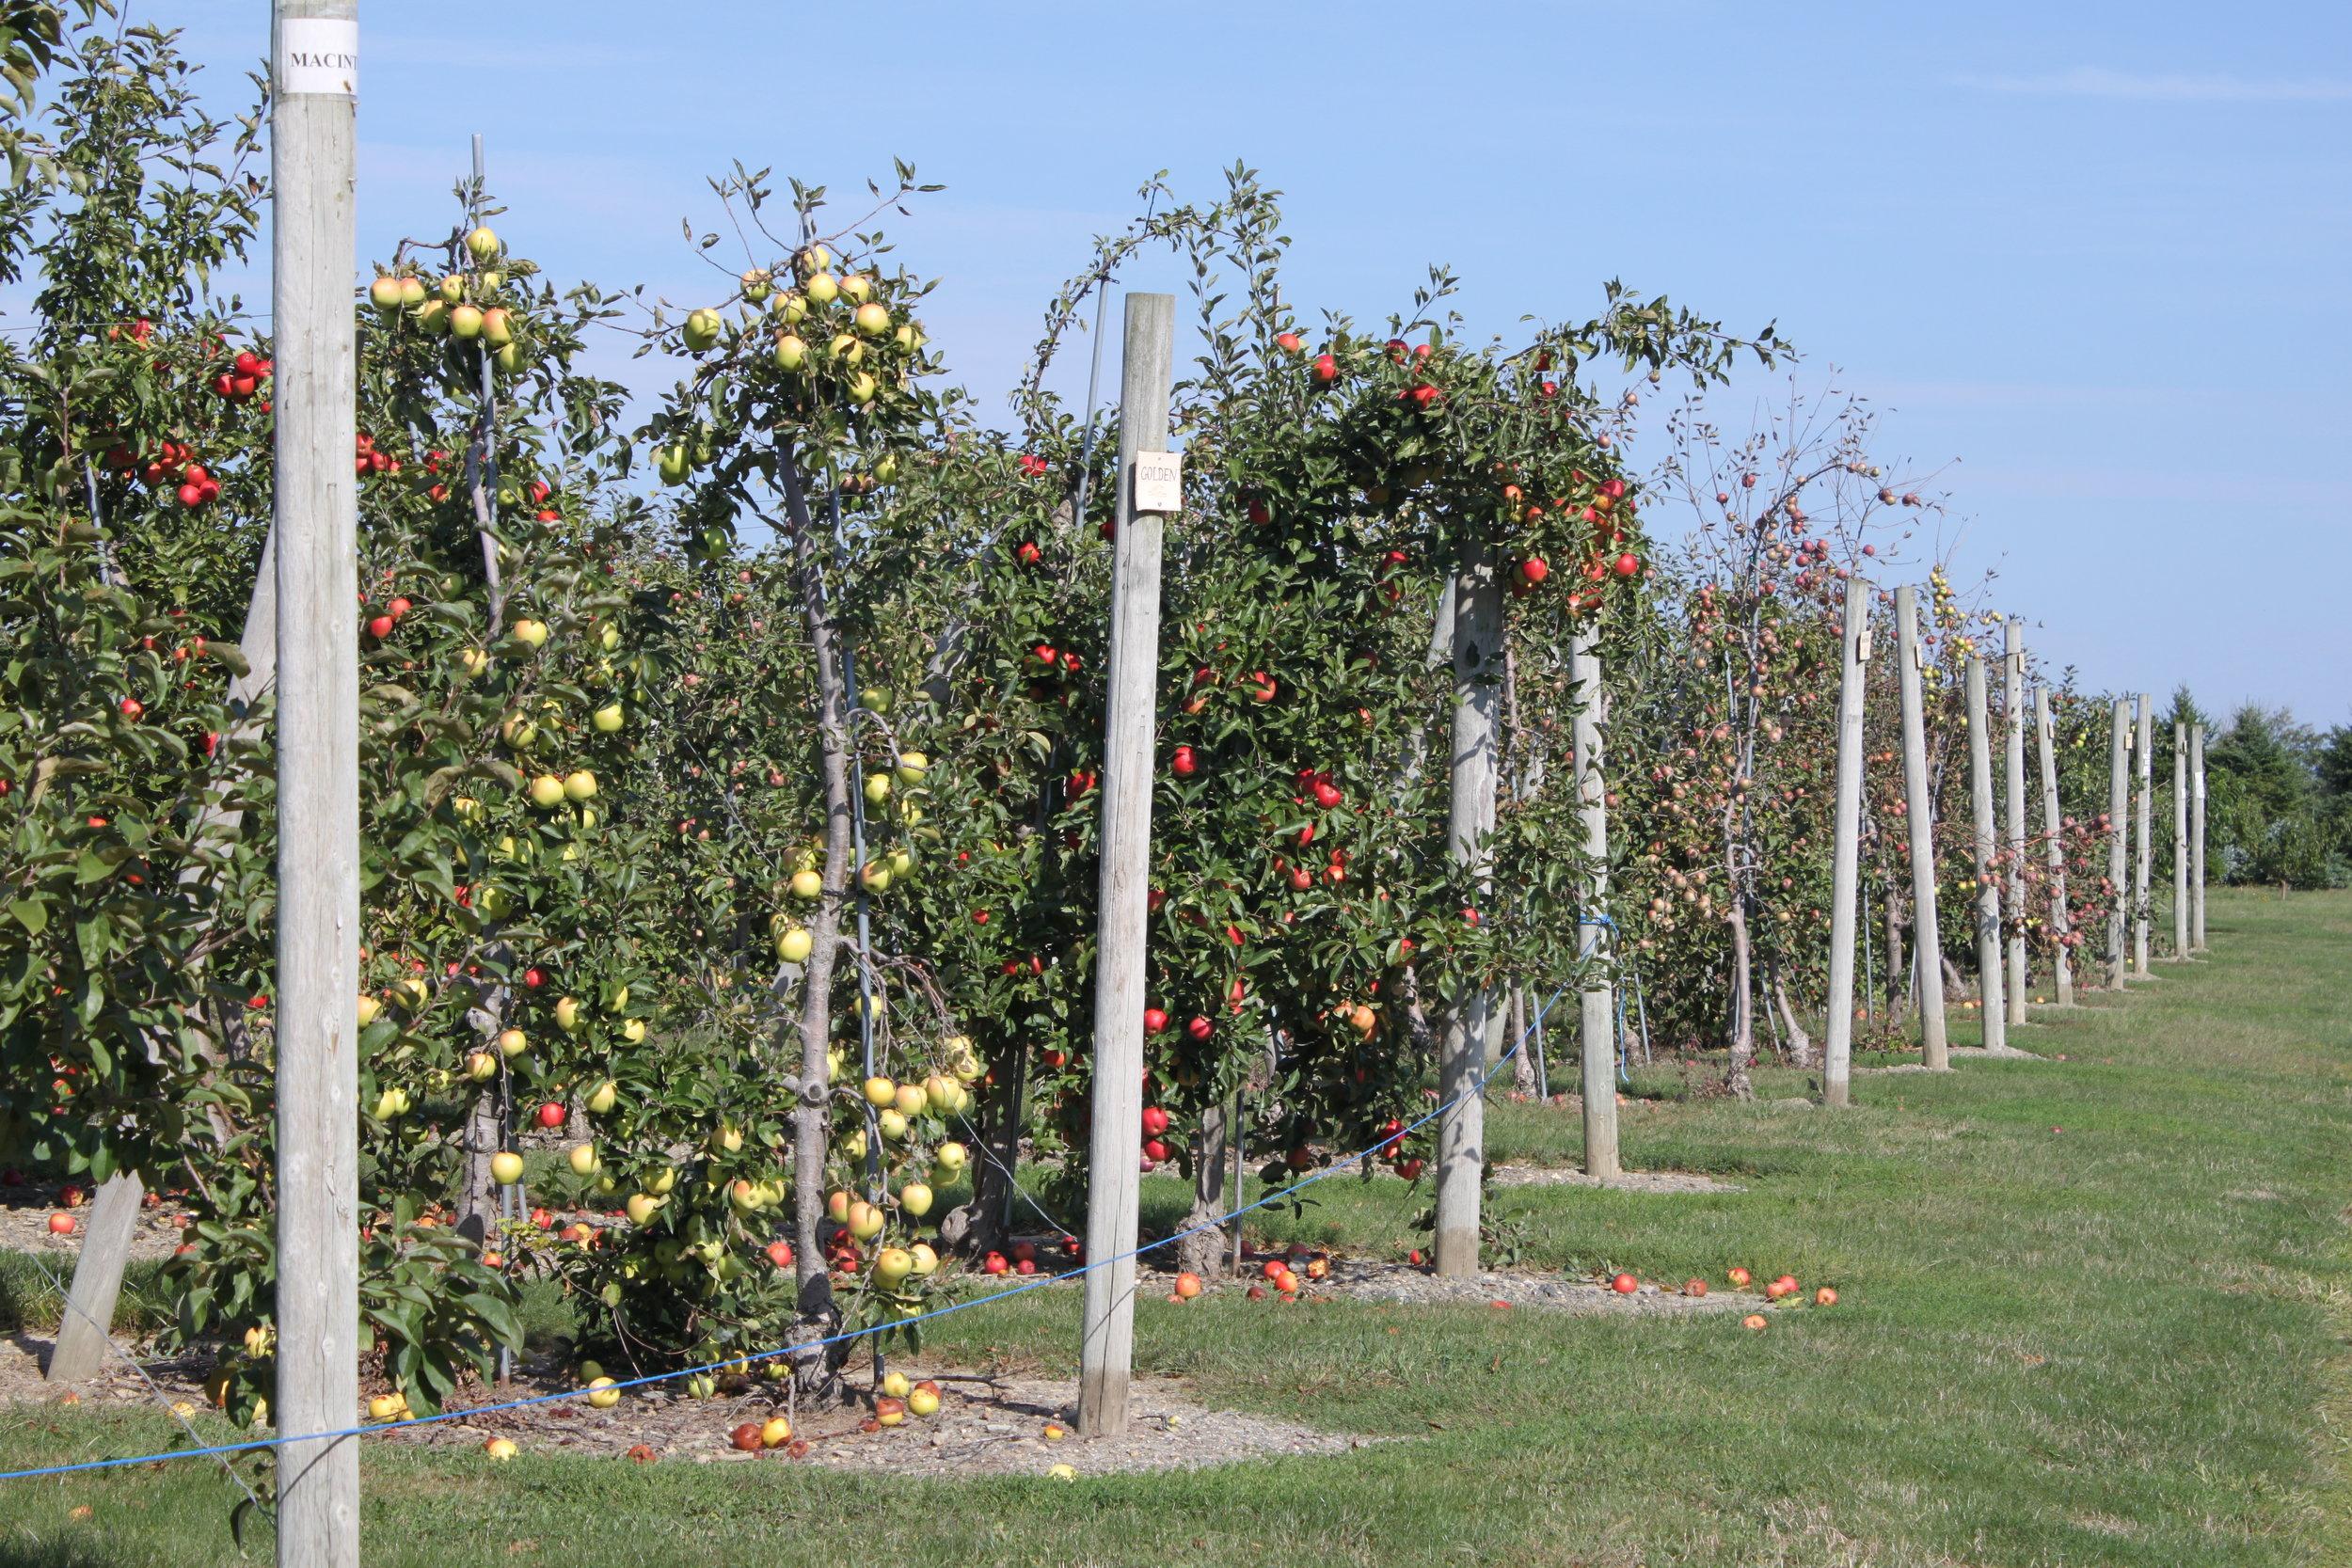 Apple Orchard Sweet Berry Farm Middletown Rhode Island Photo by Katherine Gagliano.JPG